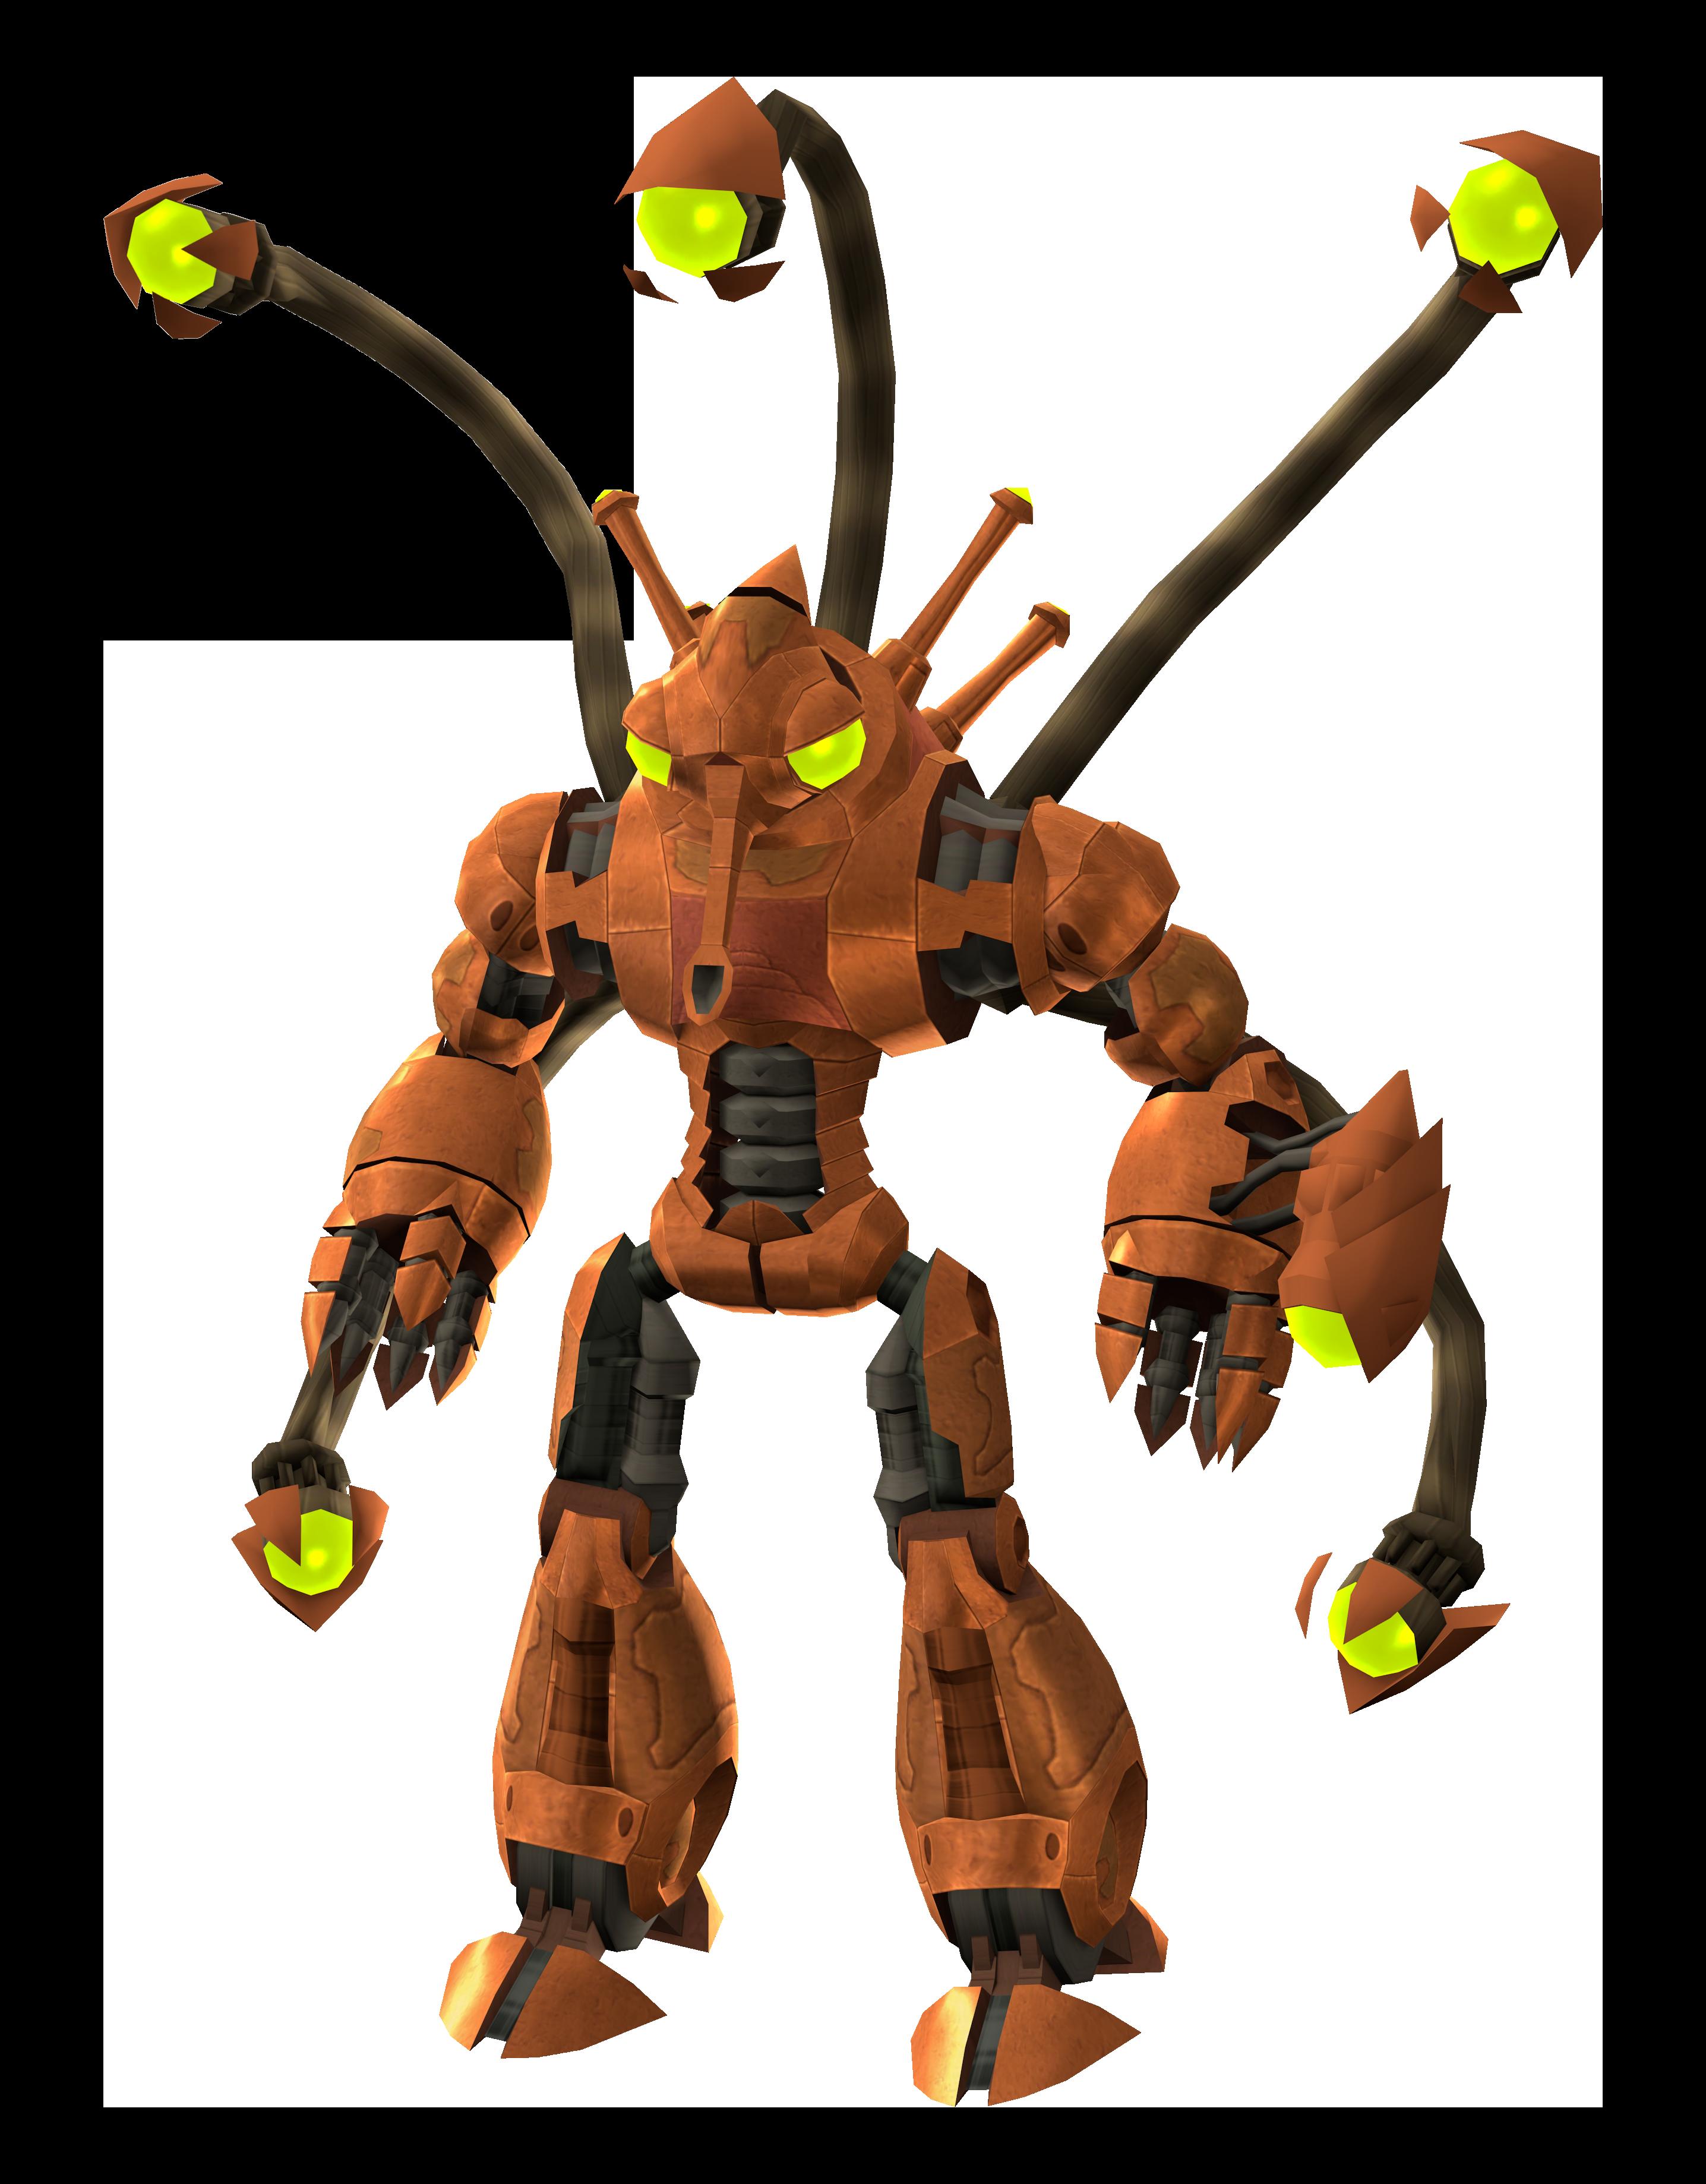 Precursor Robot Jak And Daxter Wiki Fandom